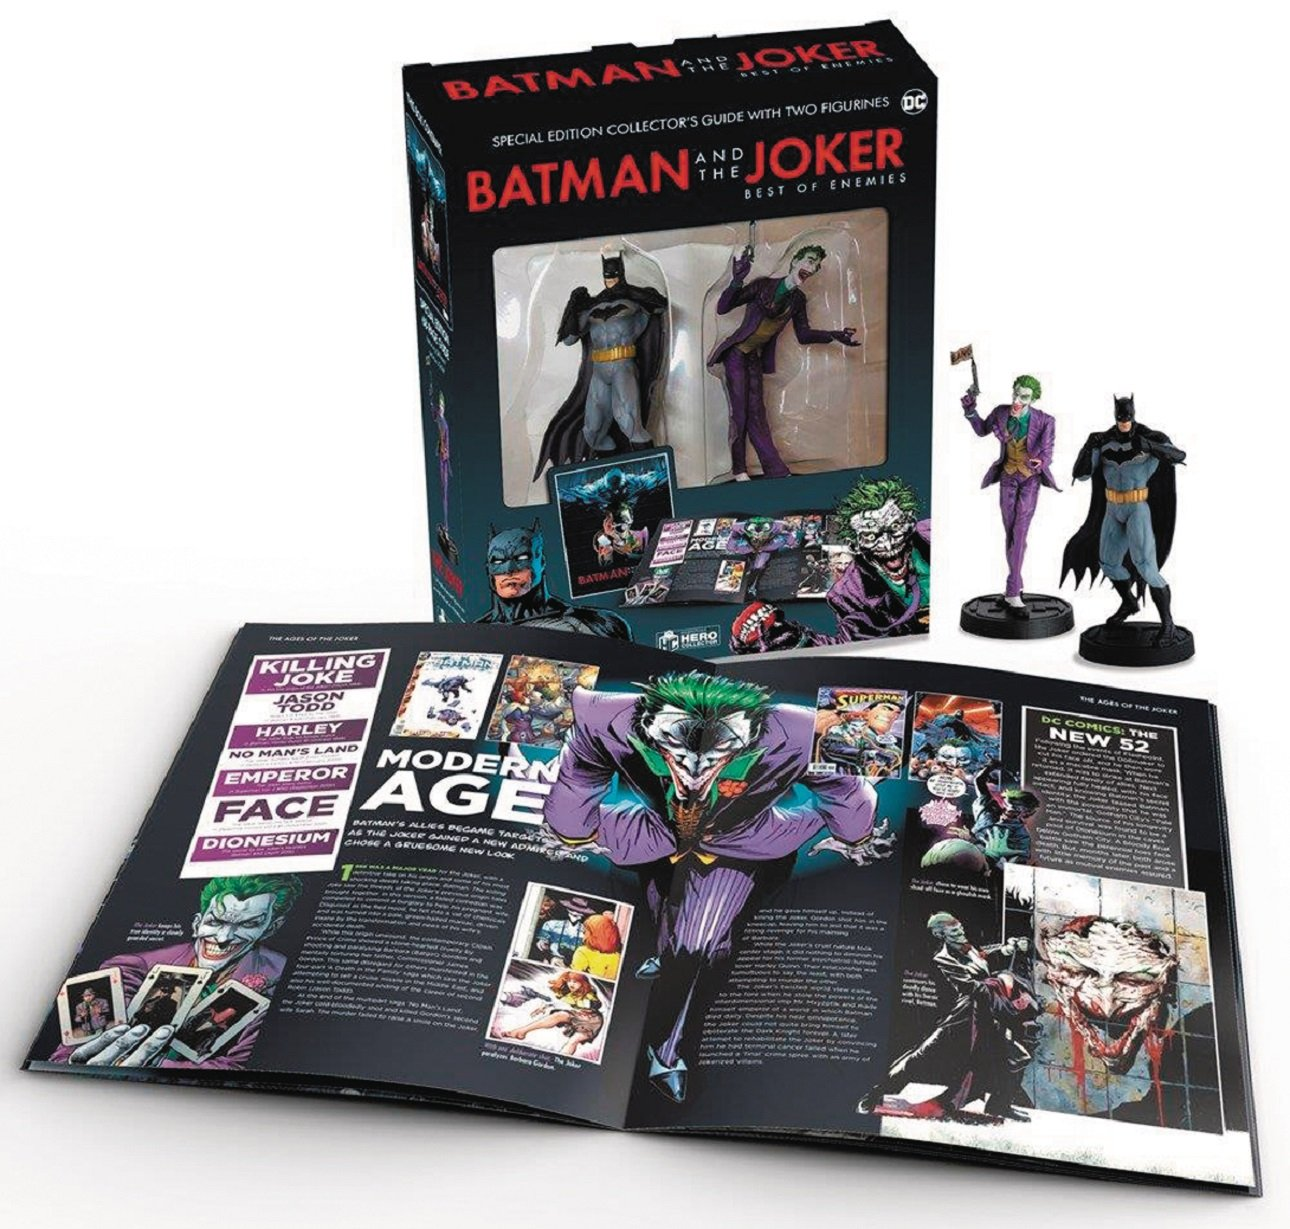 batman and the joker hardcover.jpg